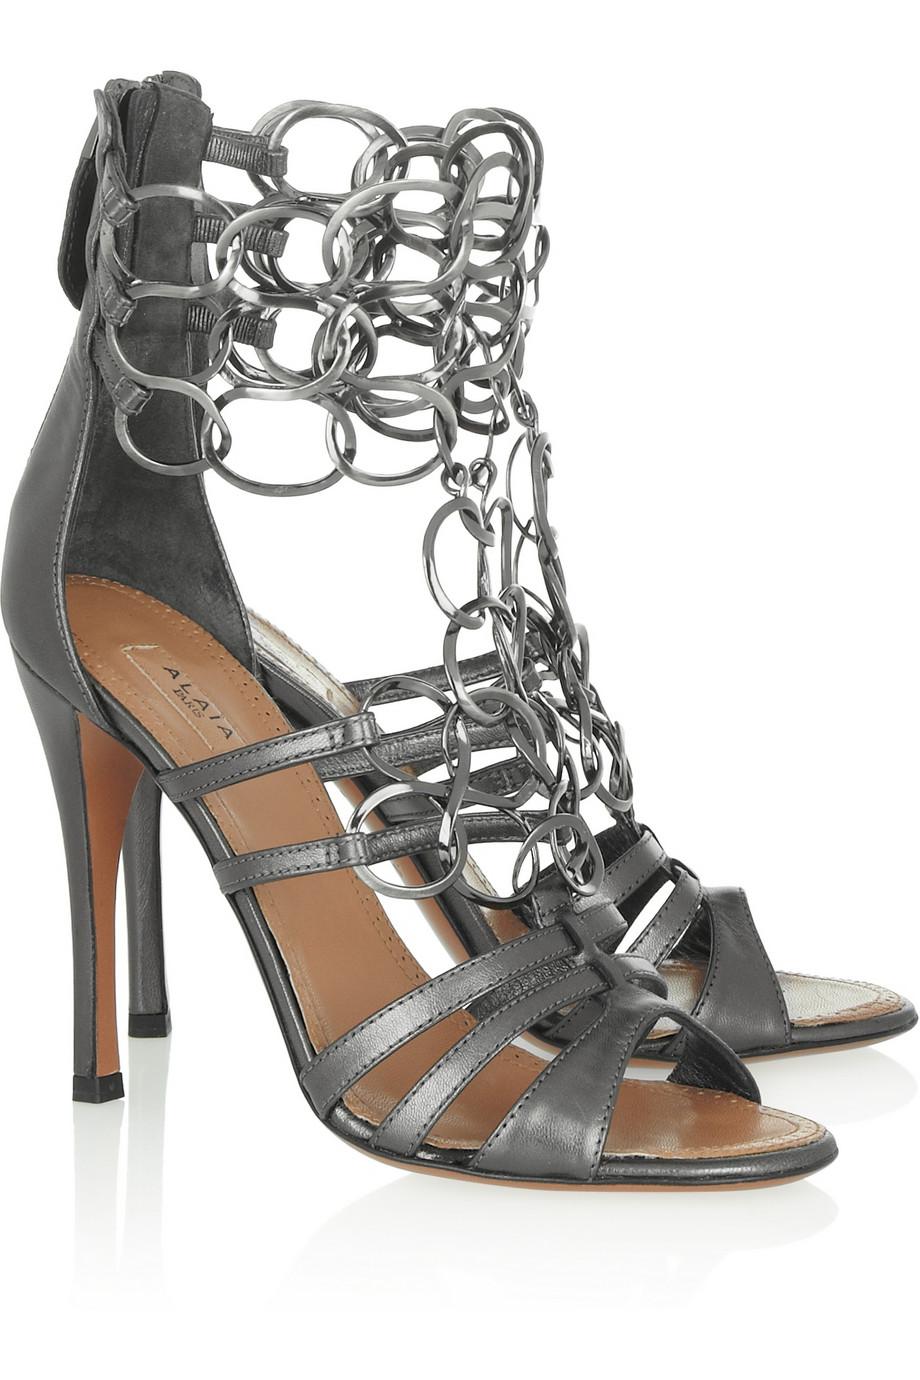 Alaïa metallic leather sandals